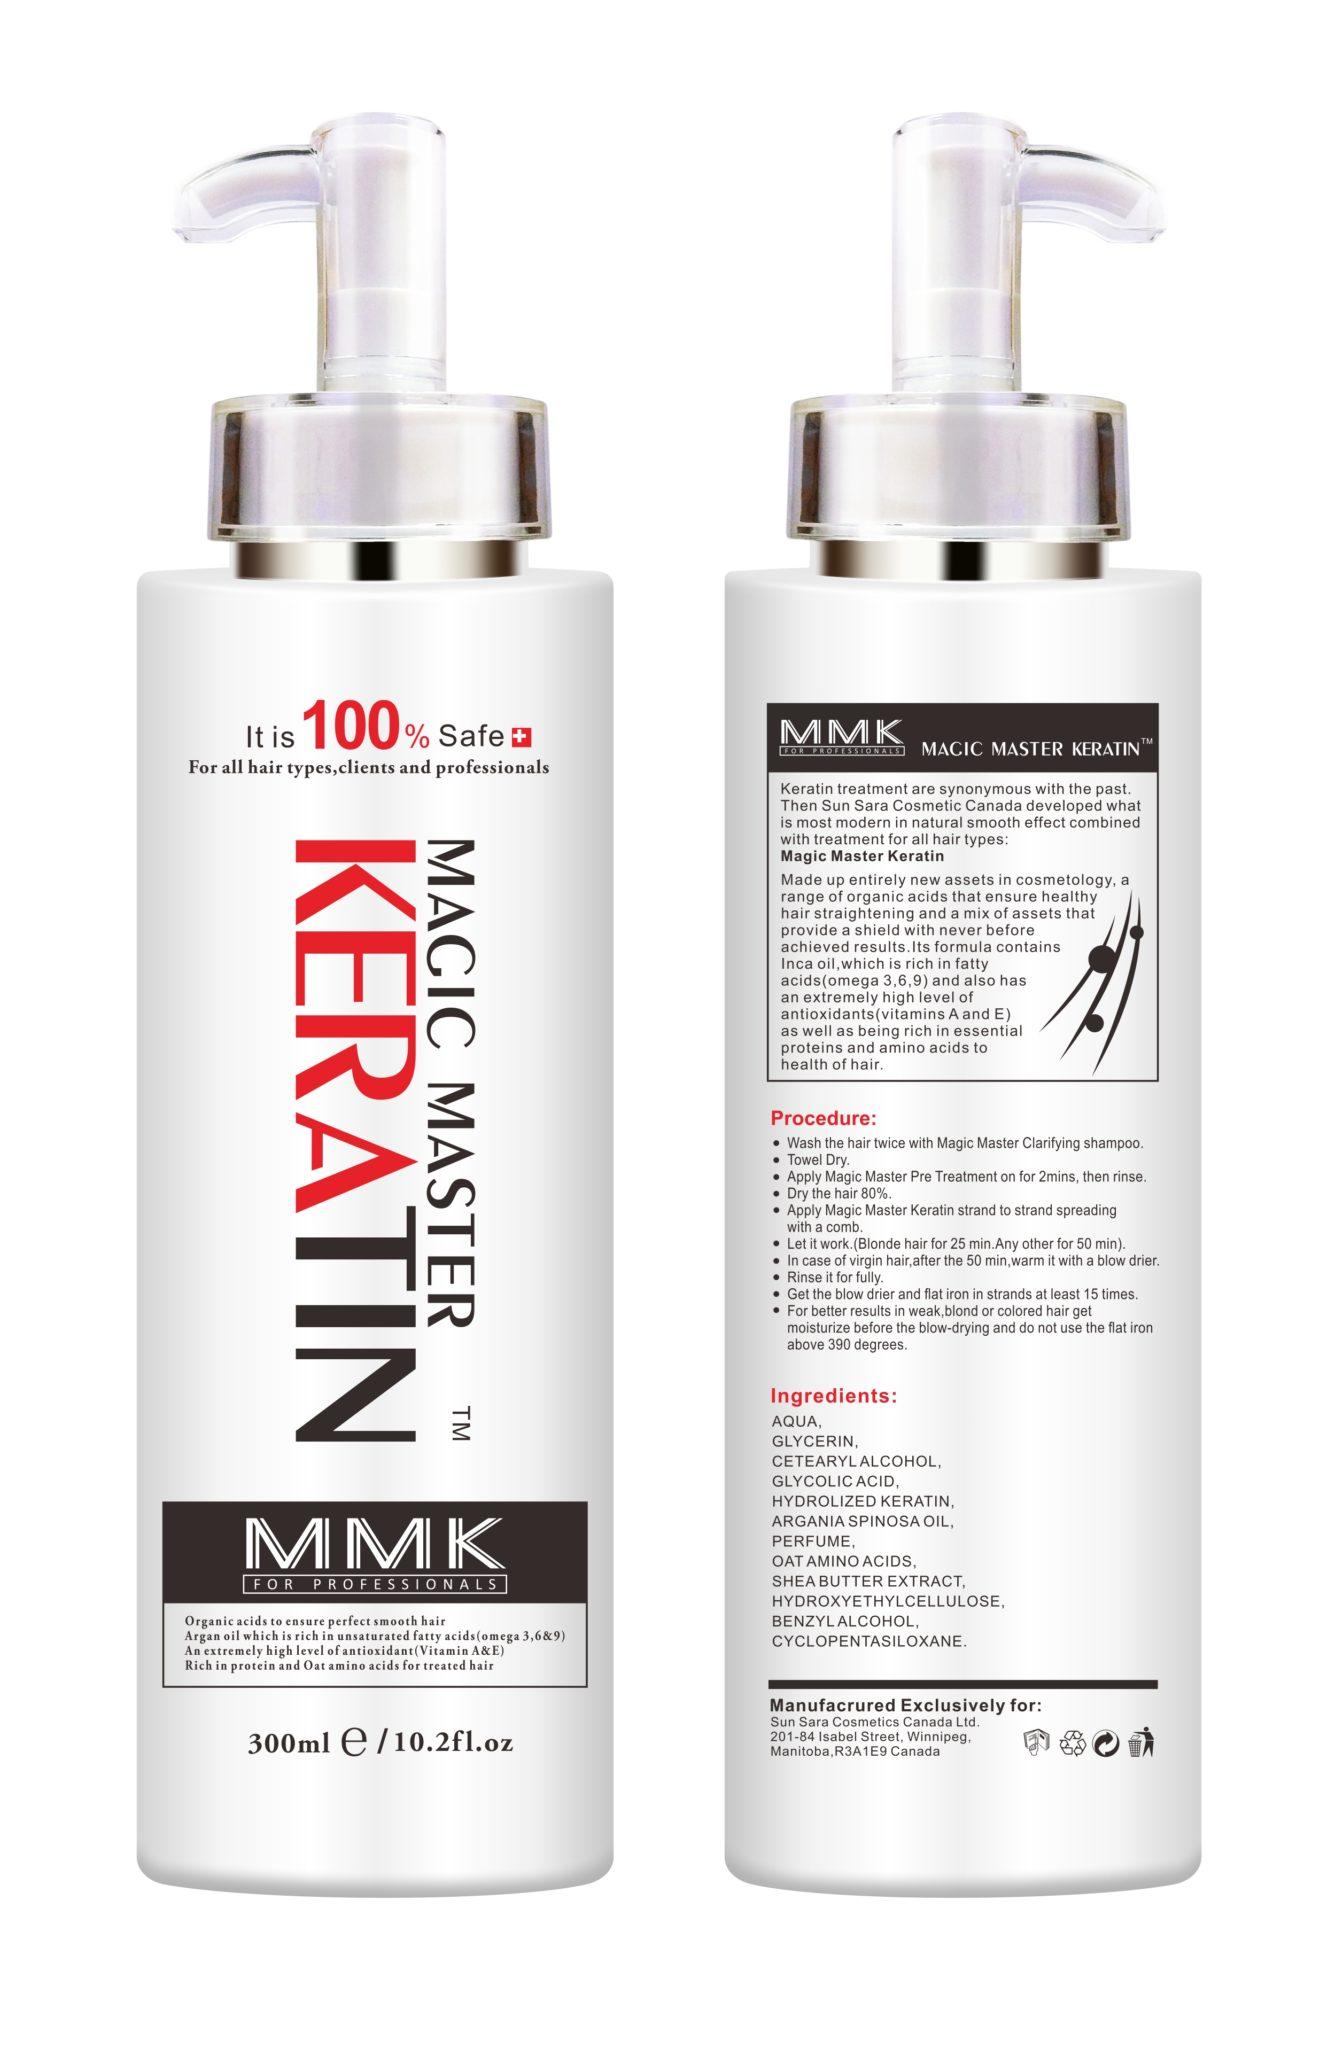 The Most Popular Brazilian Magic Master Keratin Treatment For Hair